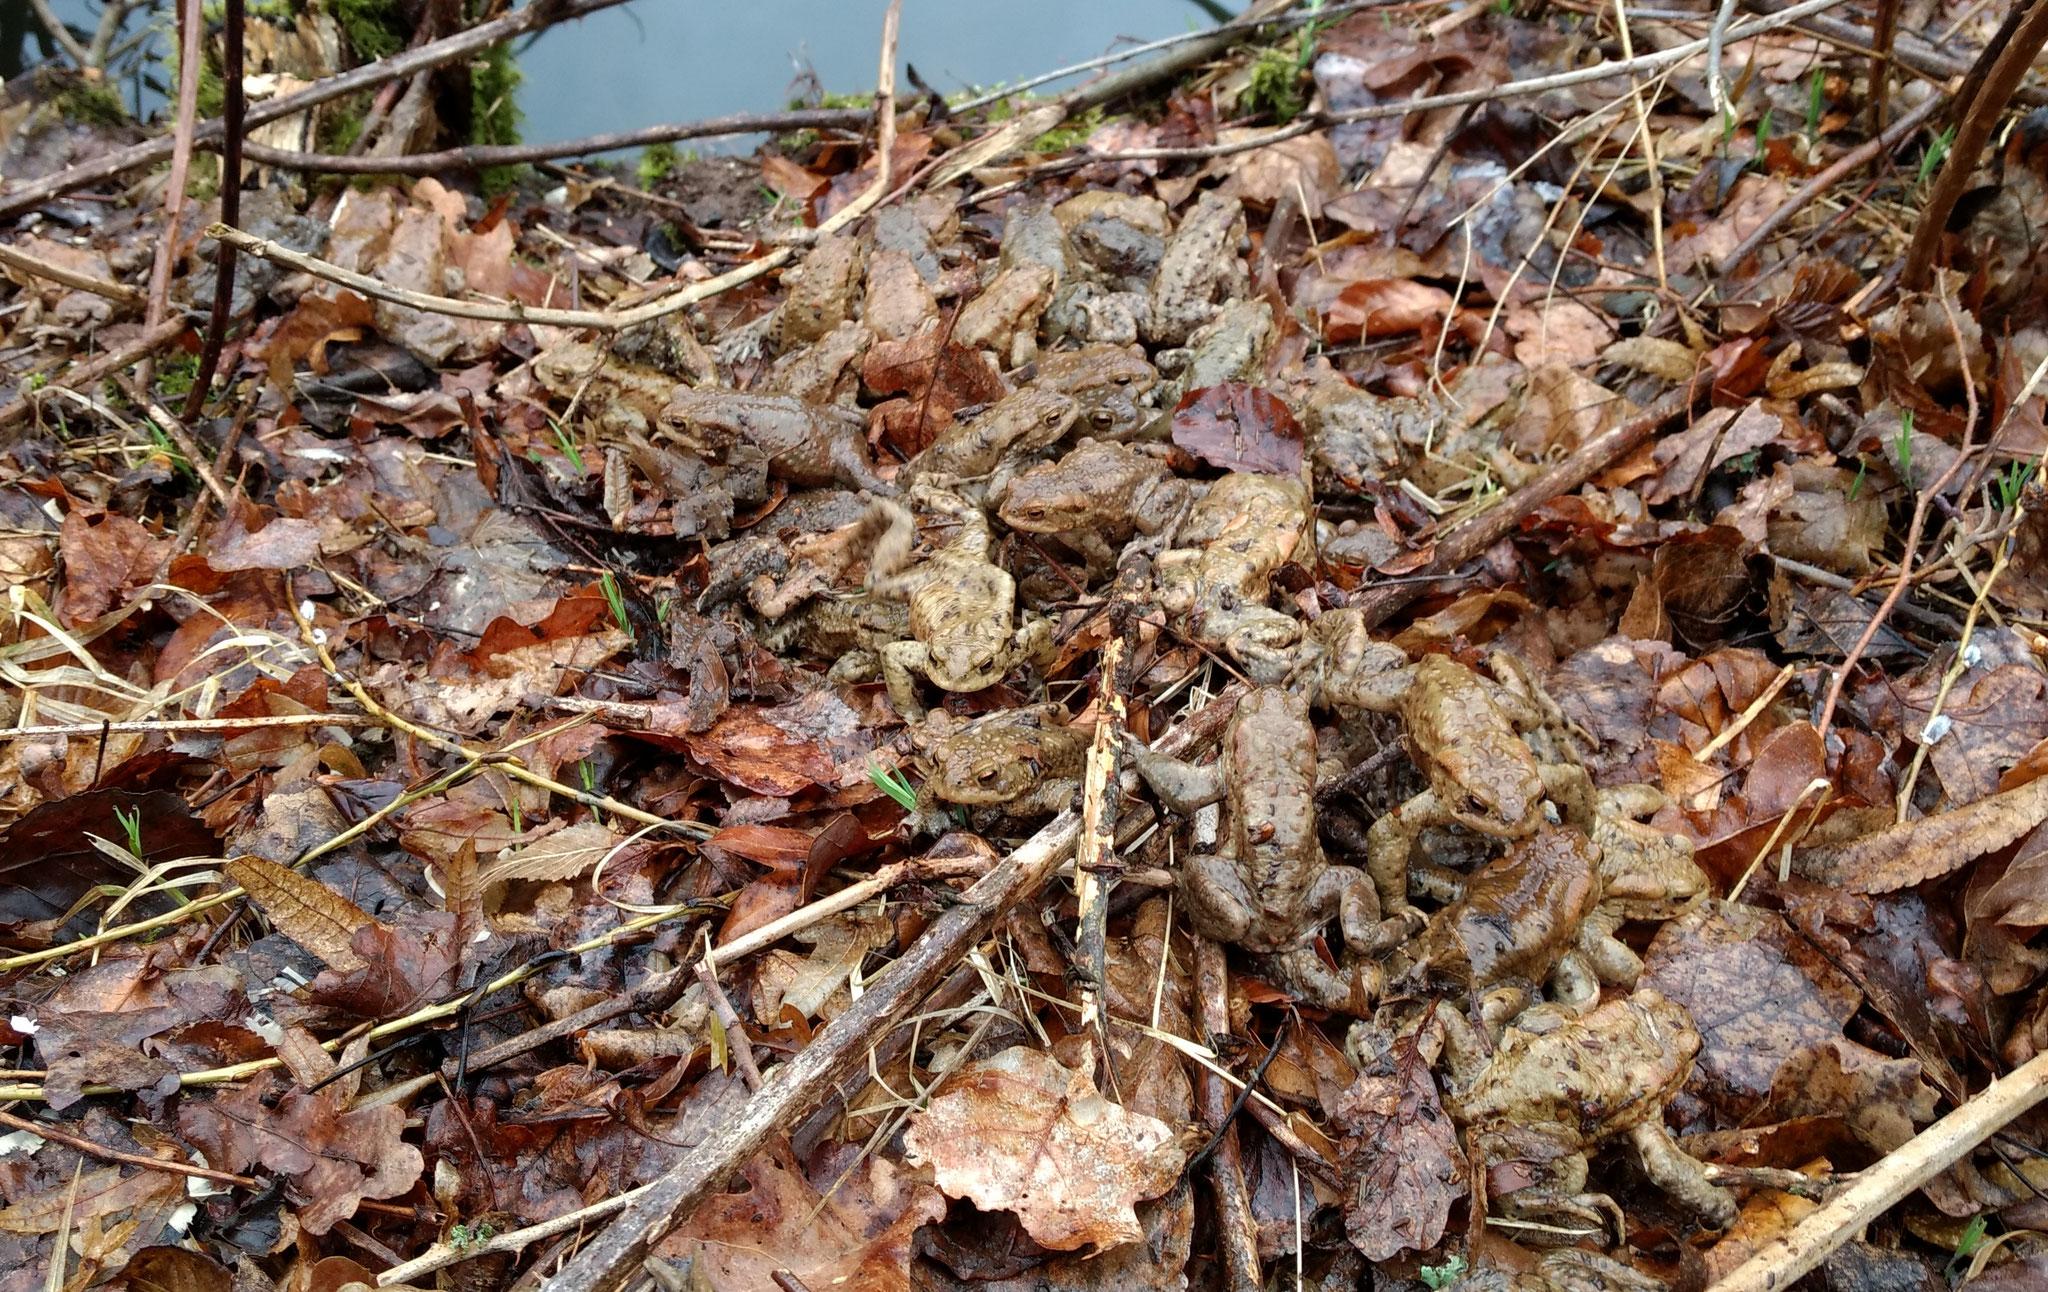 18.03.2017, Erdkröten an den Hirschbornteichen